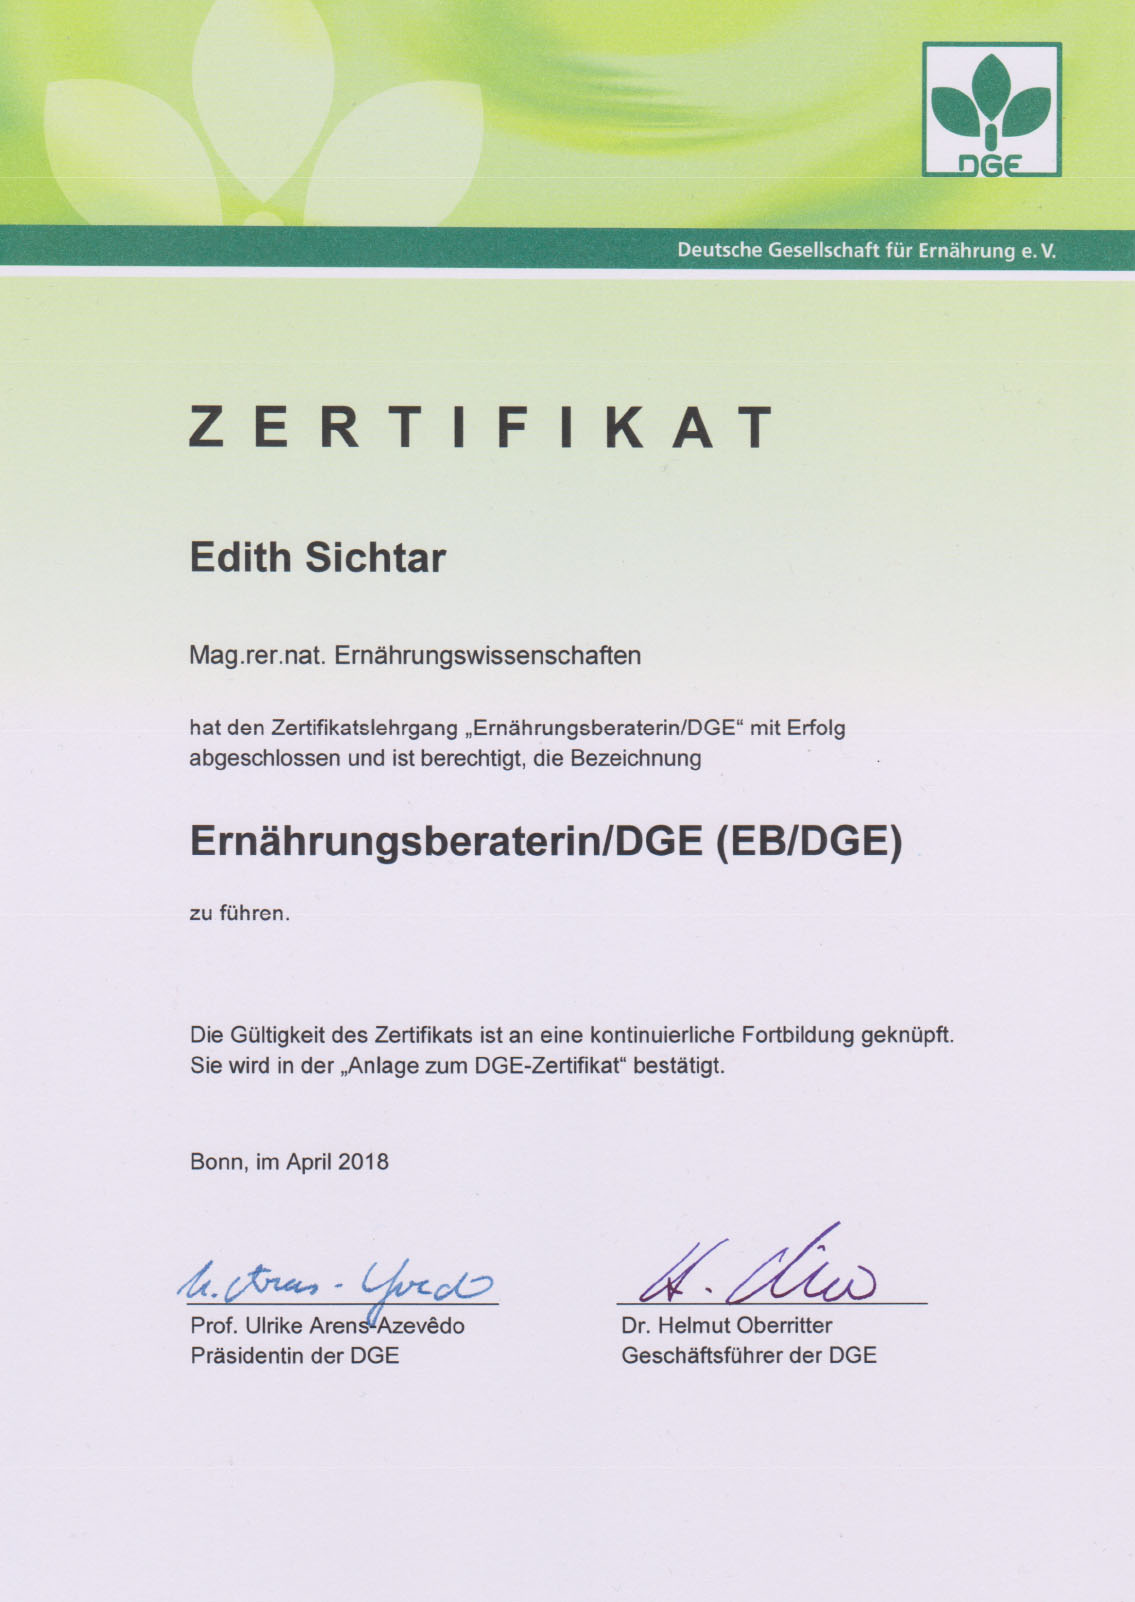 Zertifikat Ernährungsberaterin, Edith Sichtar